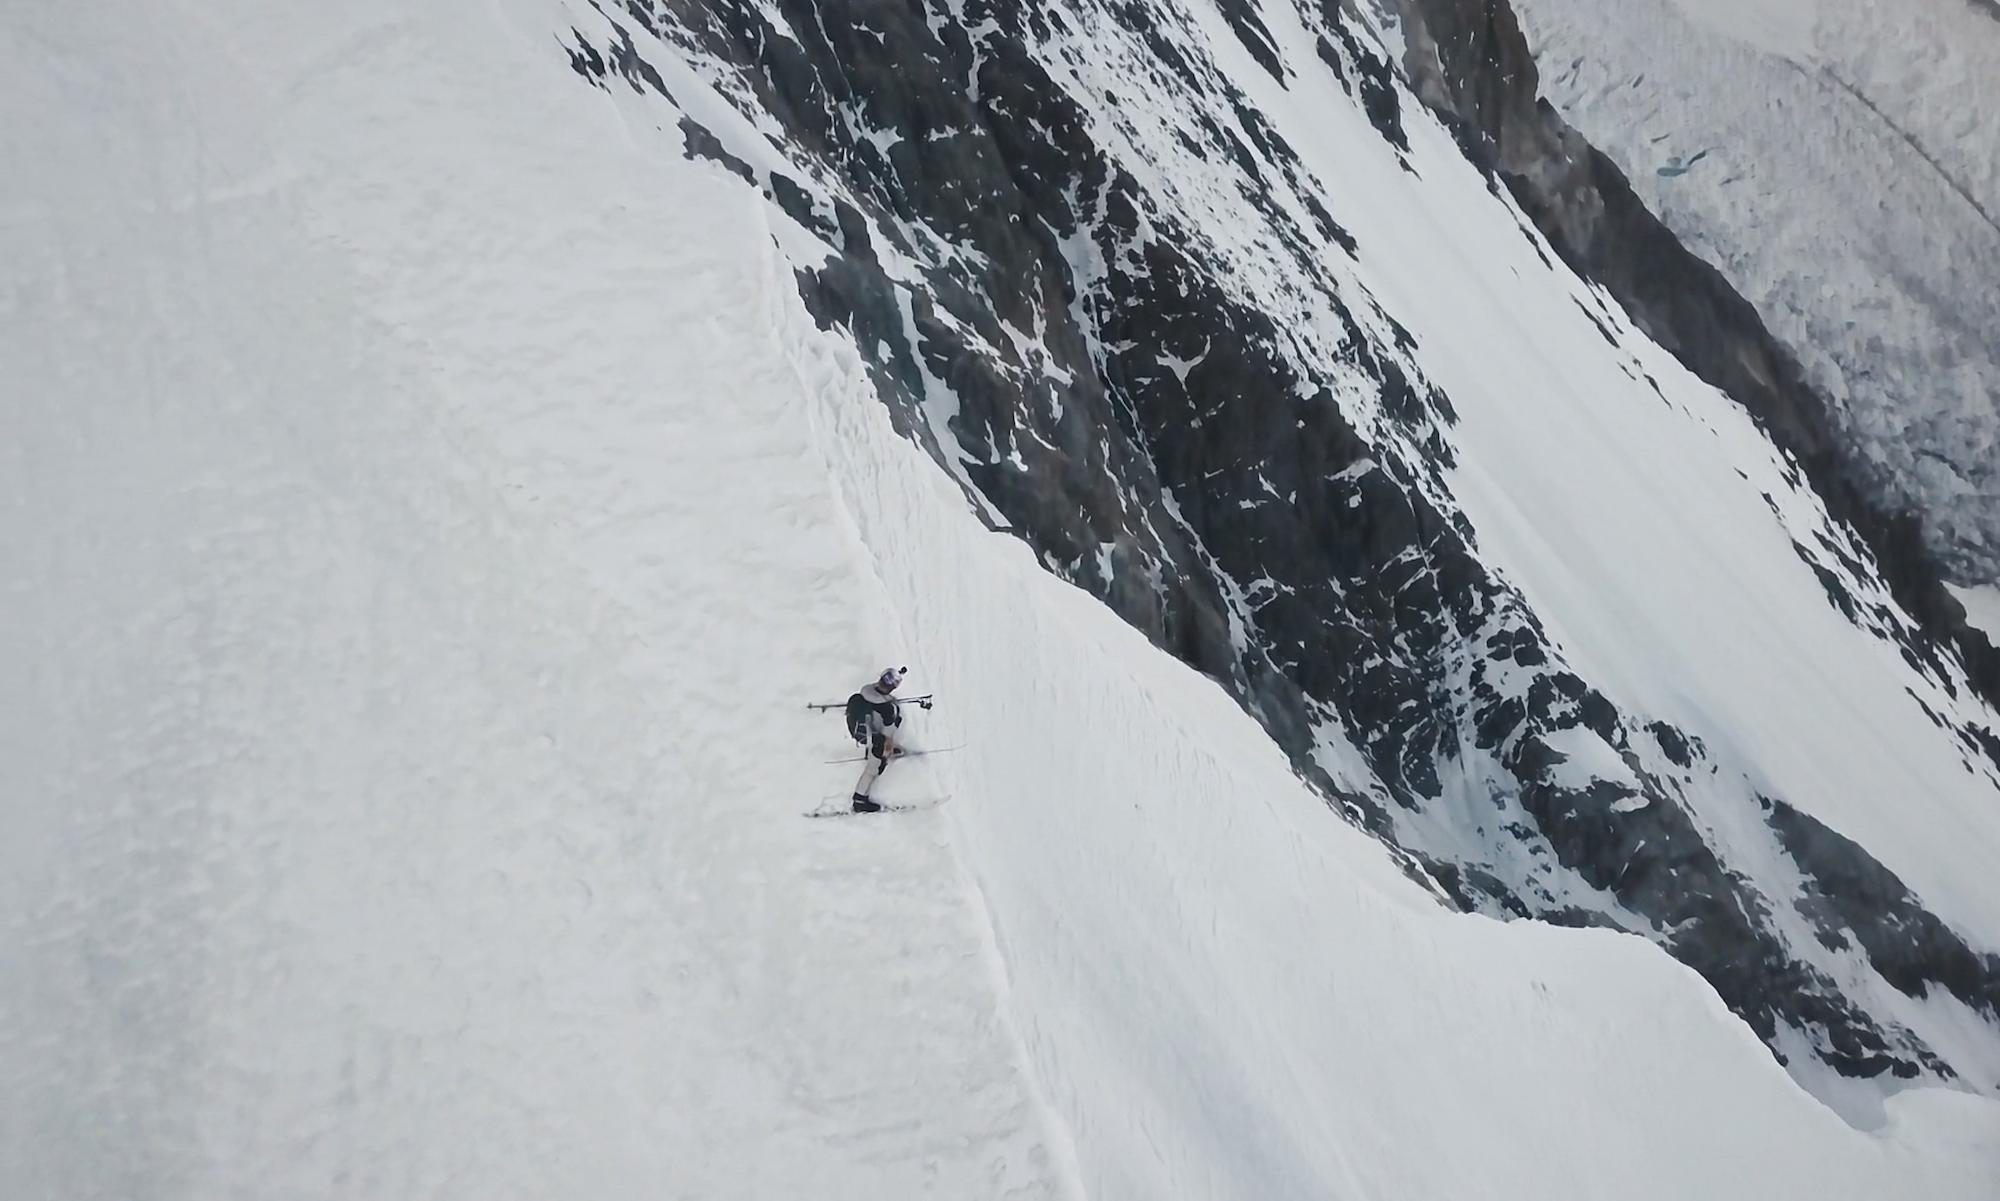 Andrzej Bargiel descending K2 on skis